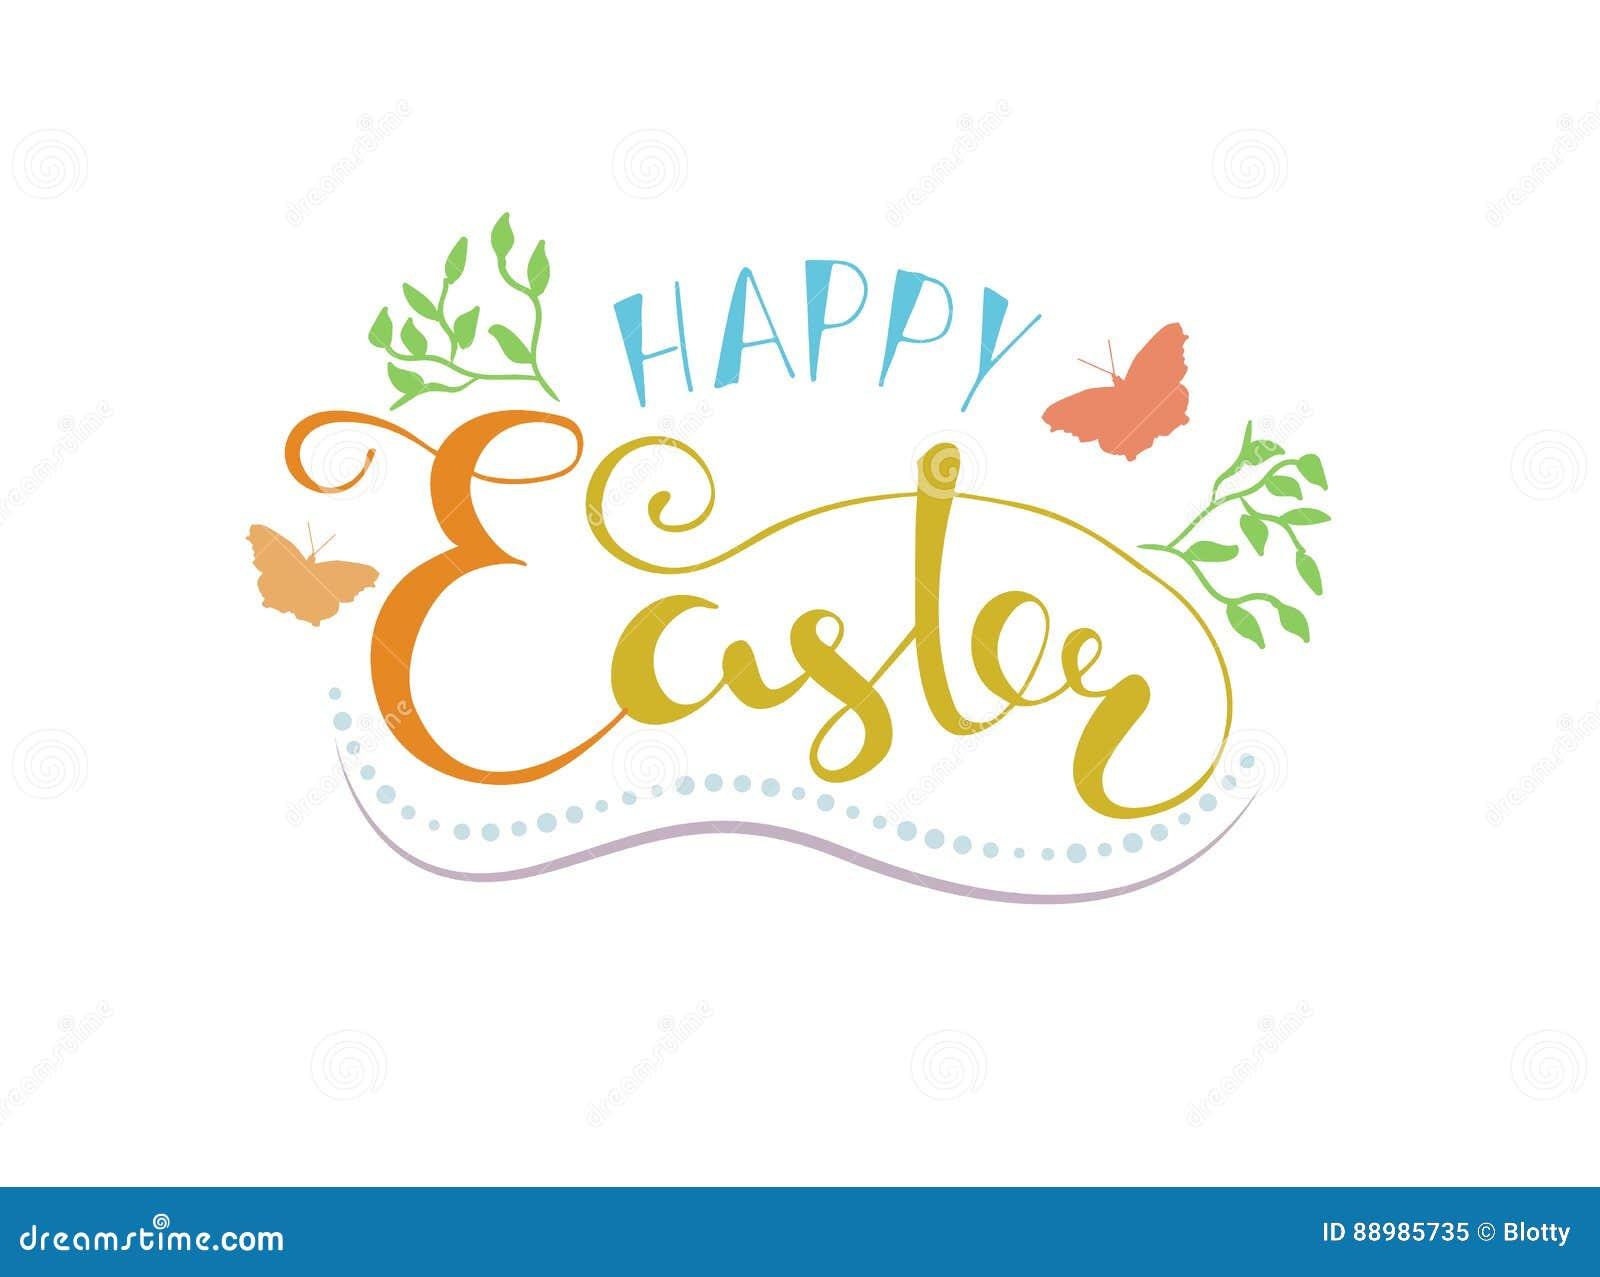 Happy Easter Lettering Typography. Seasons Greetings Stock Vector ...